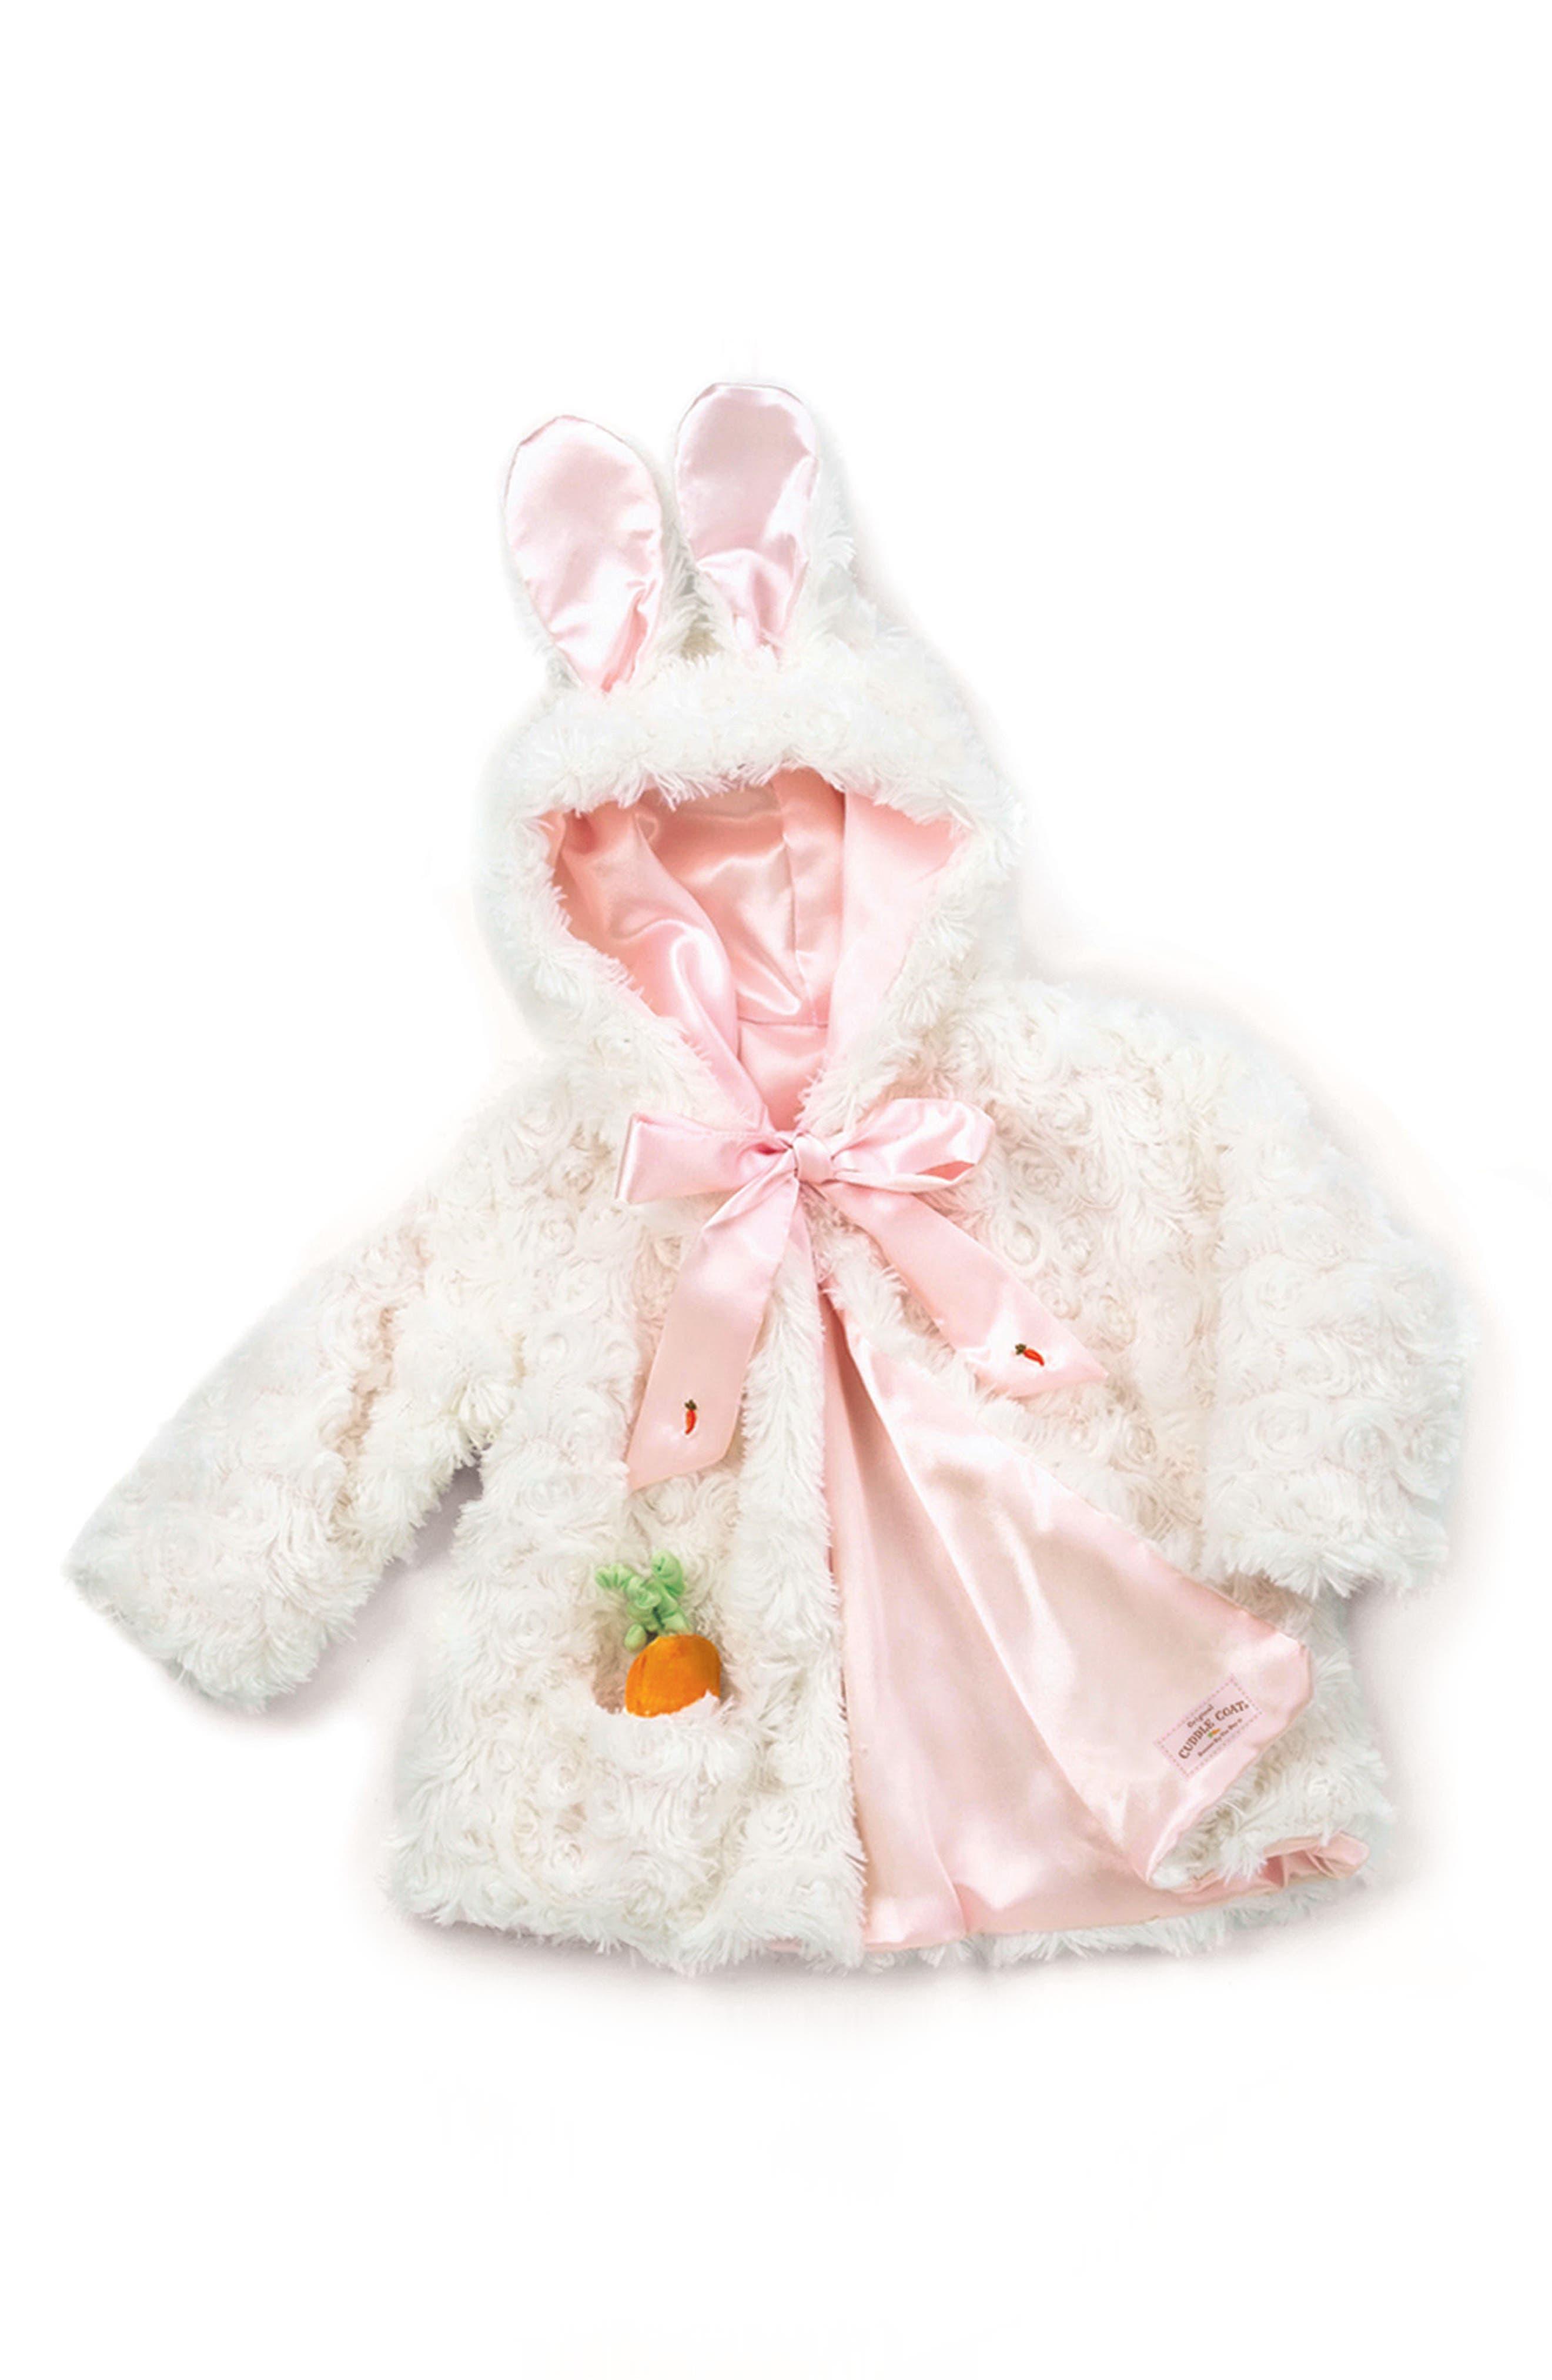 Gender-Neutral Baby Gifts | Nordstrom